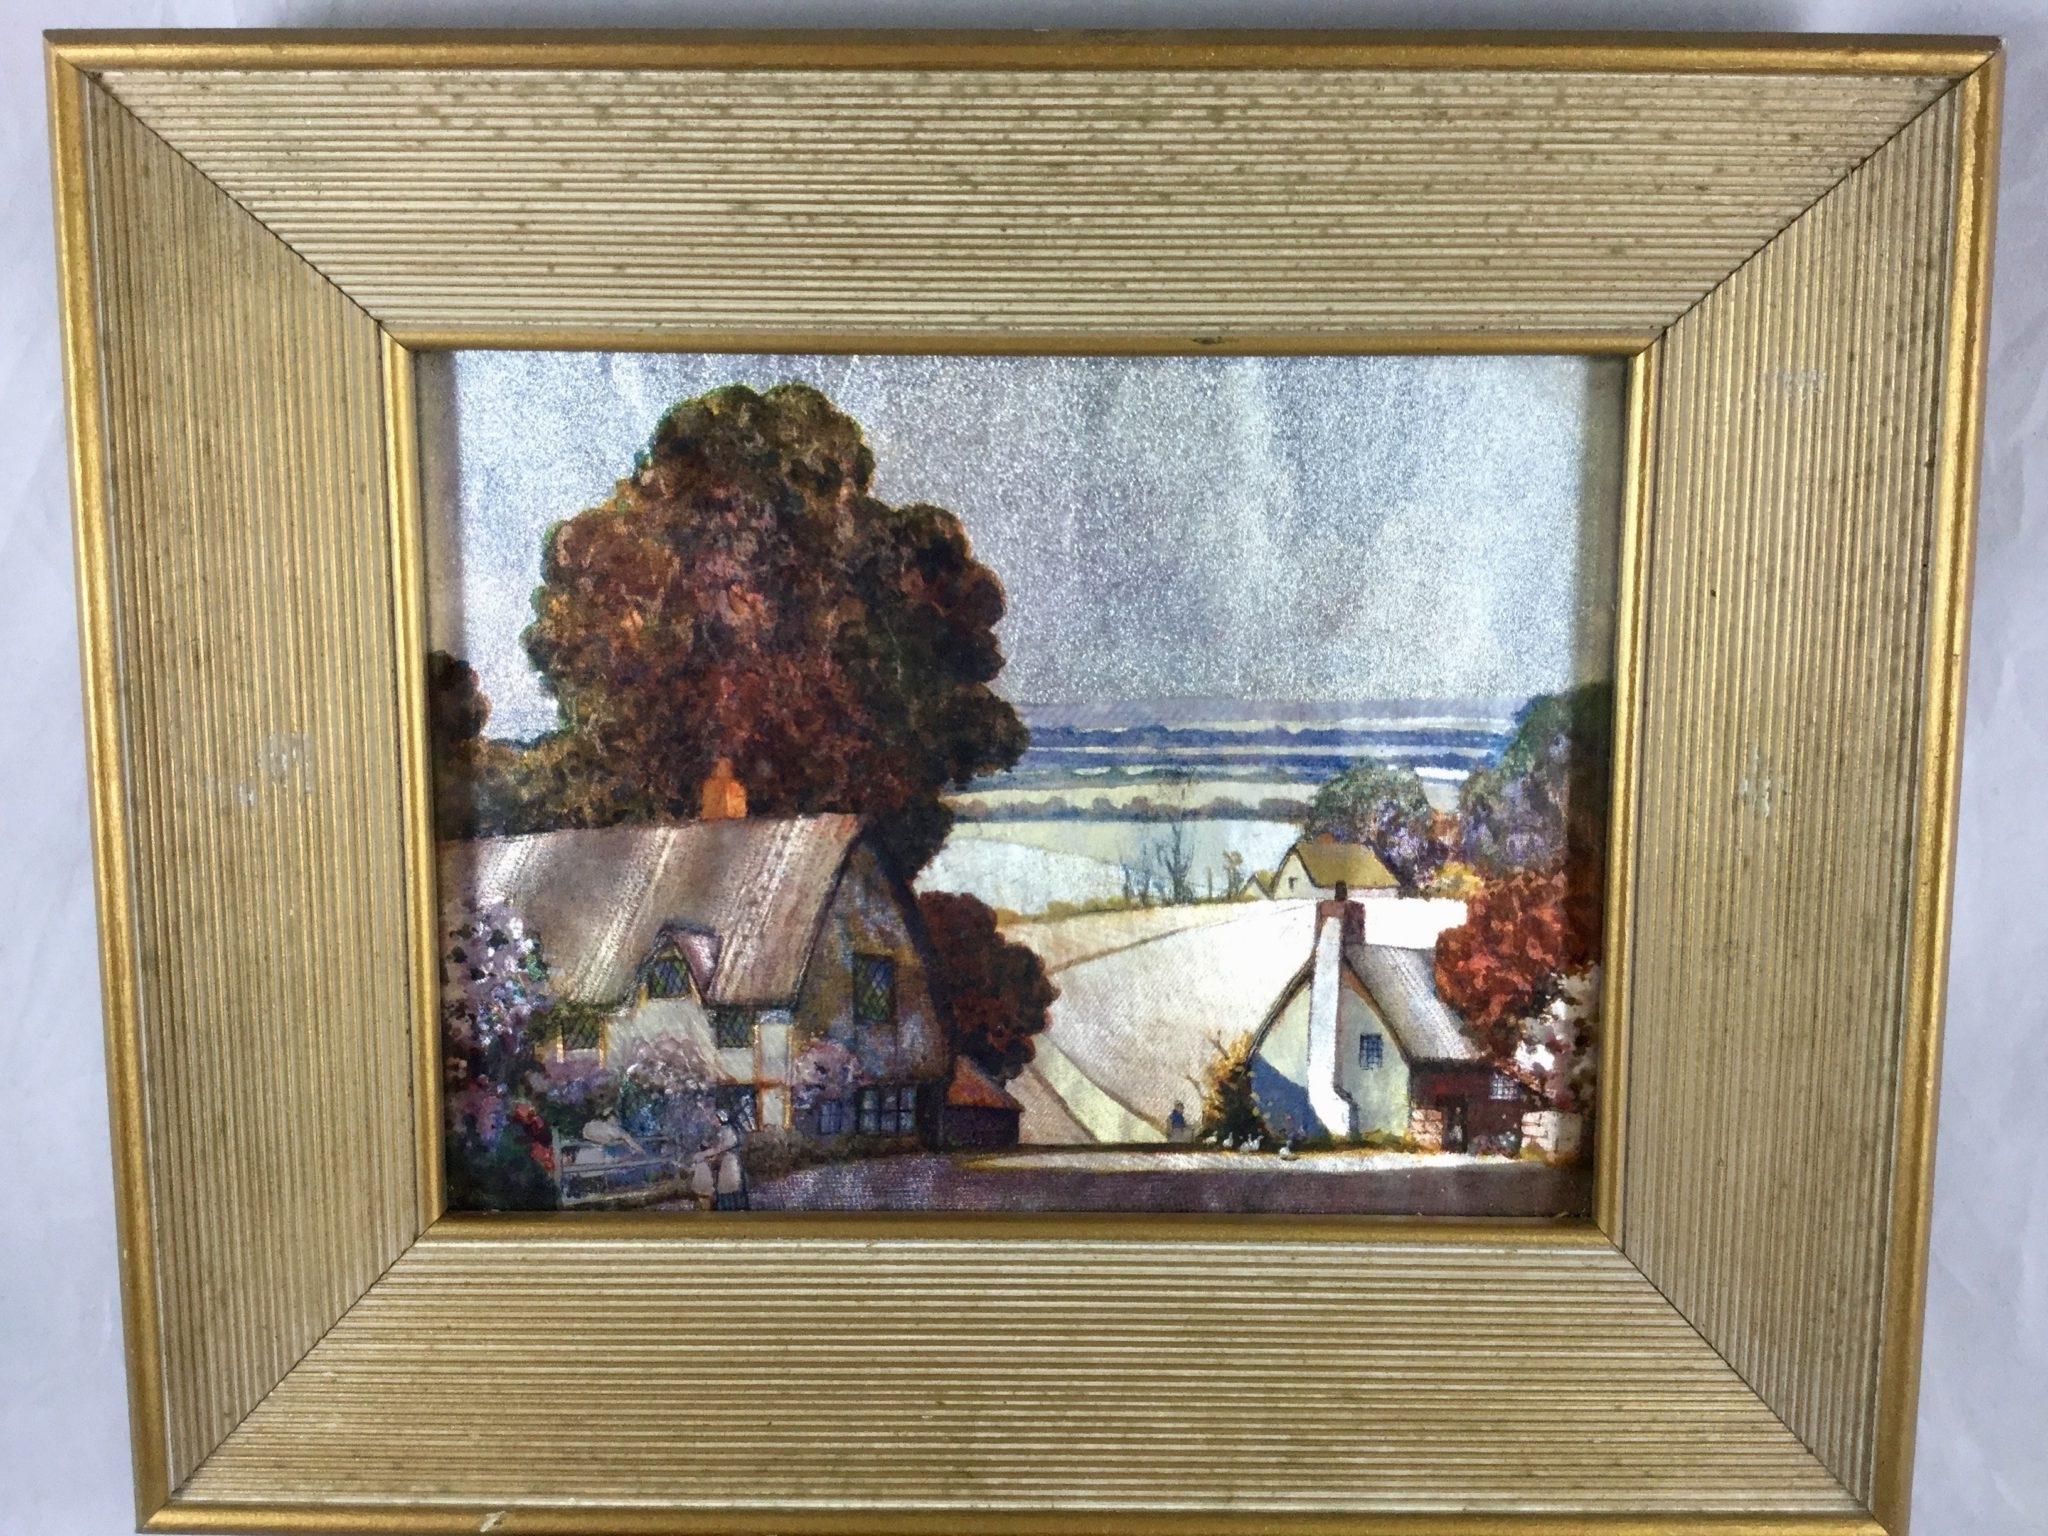 Pair Of Framed Art Prints Foil Art Printsernest Uden Country Regarding Recent Framed Country Art Prints (Gallery 15 of 15)